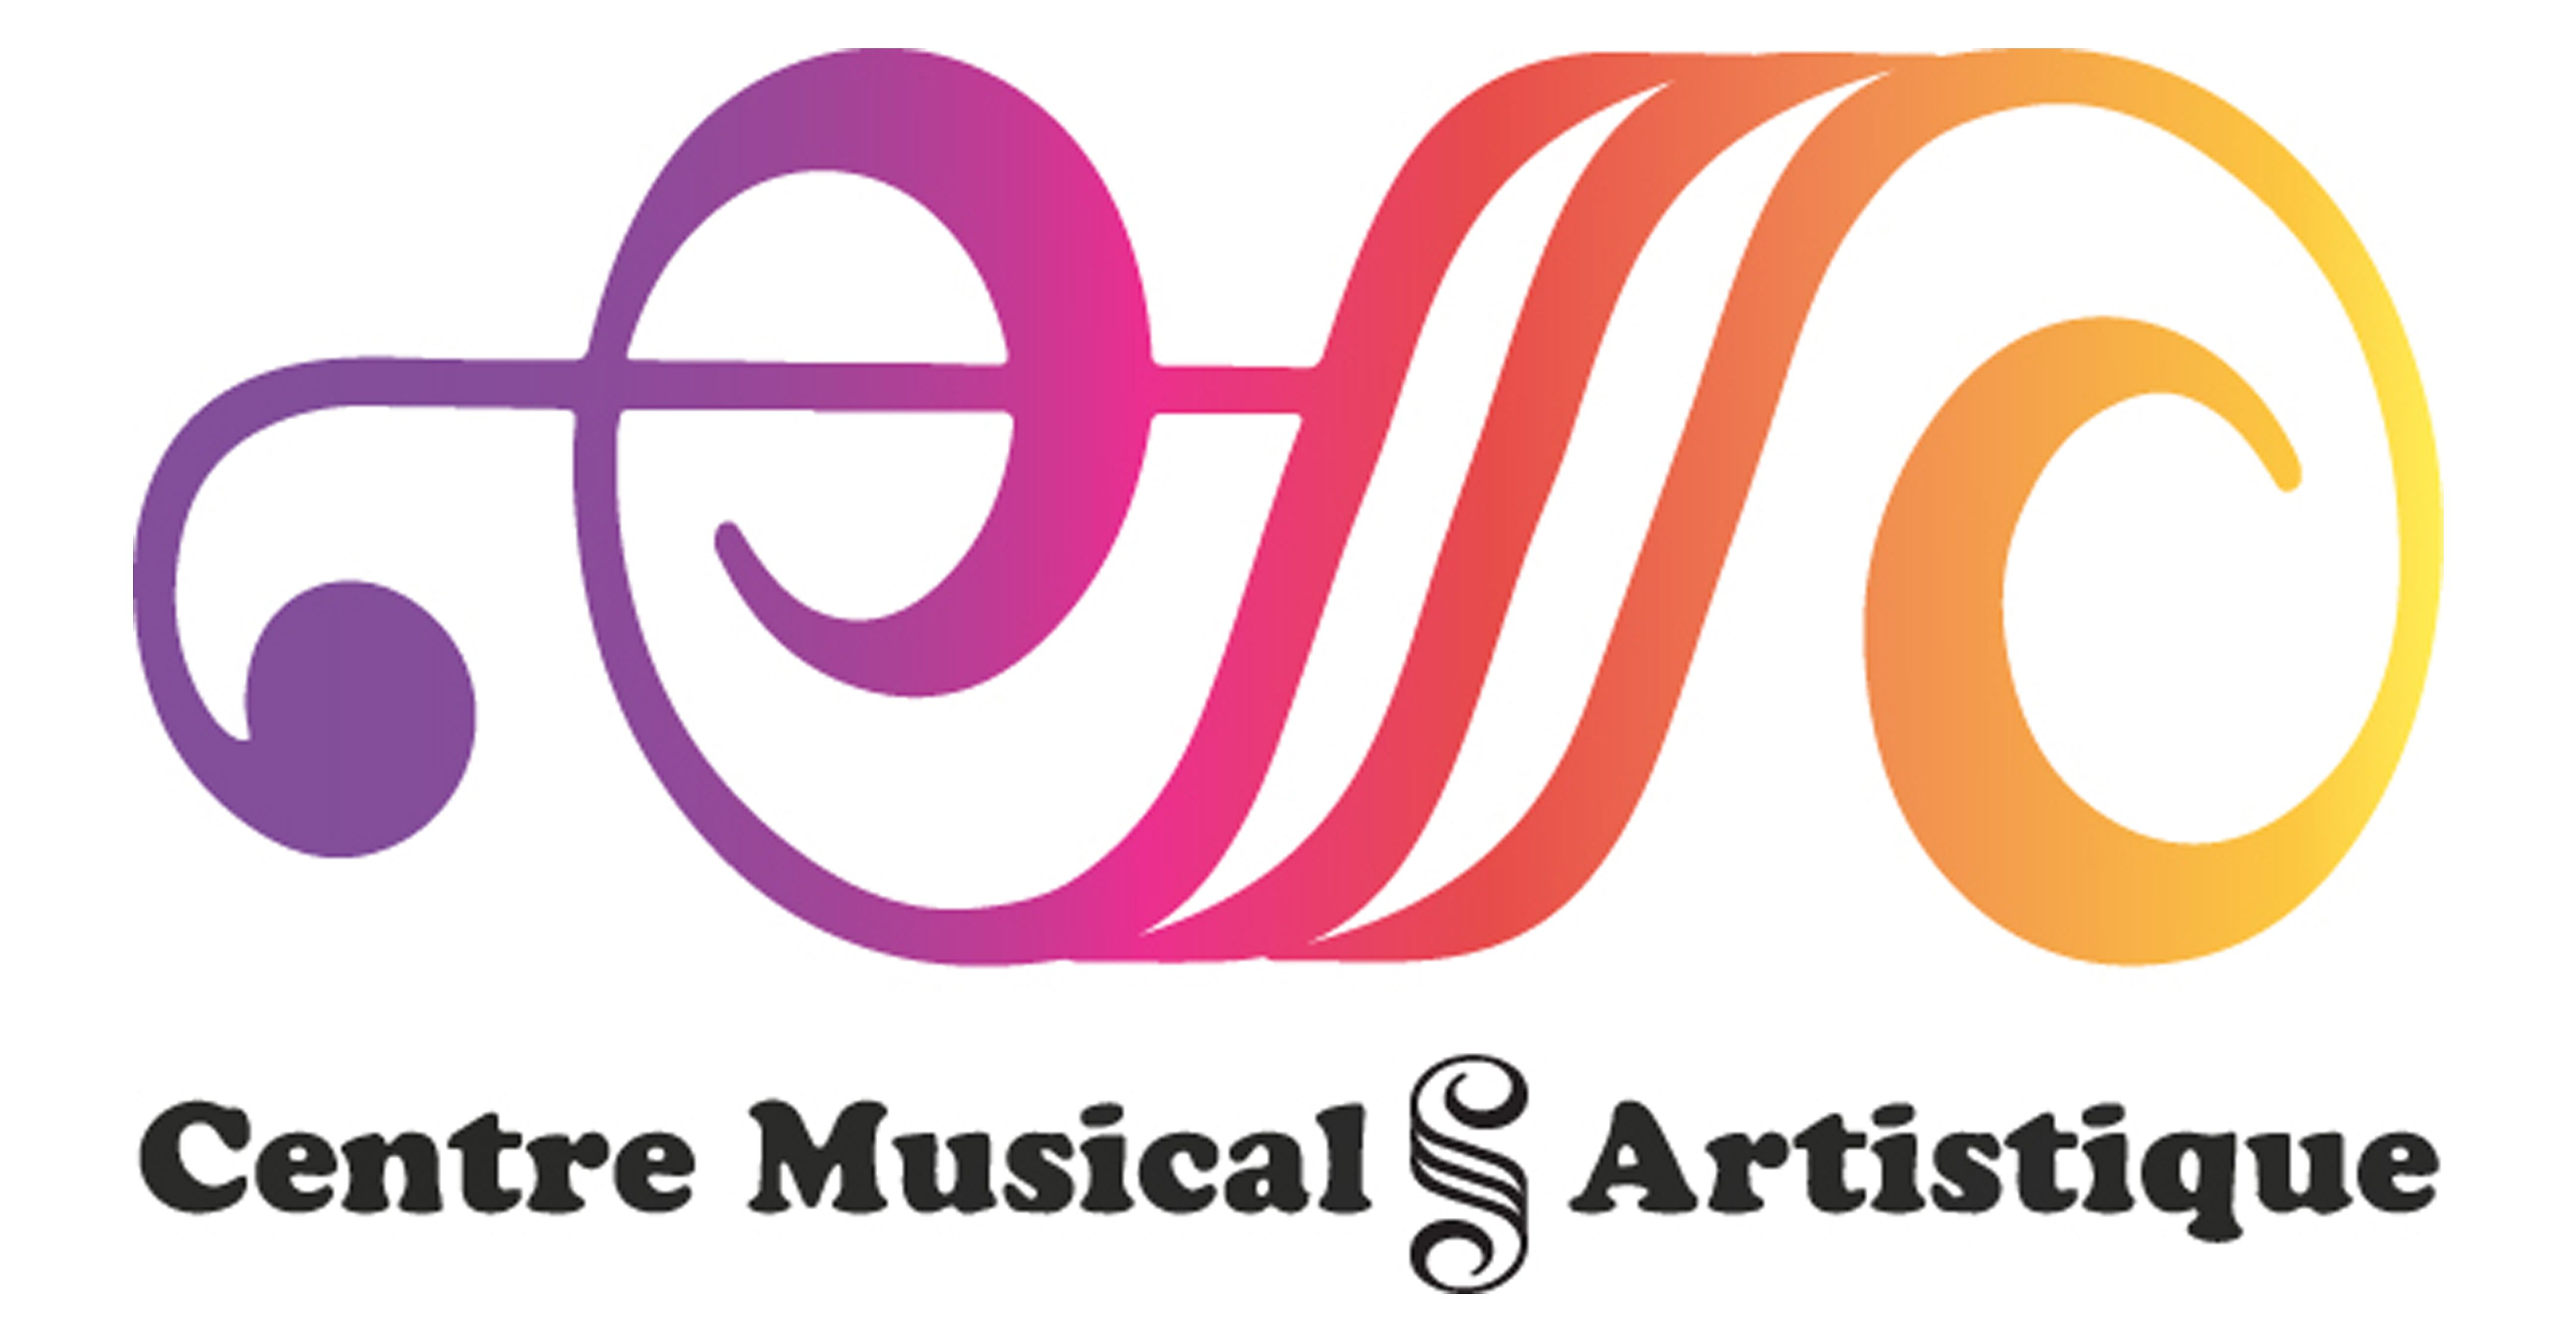 Centre Musical et Artistique – CMA